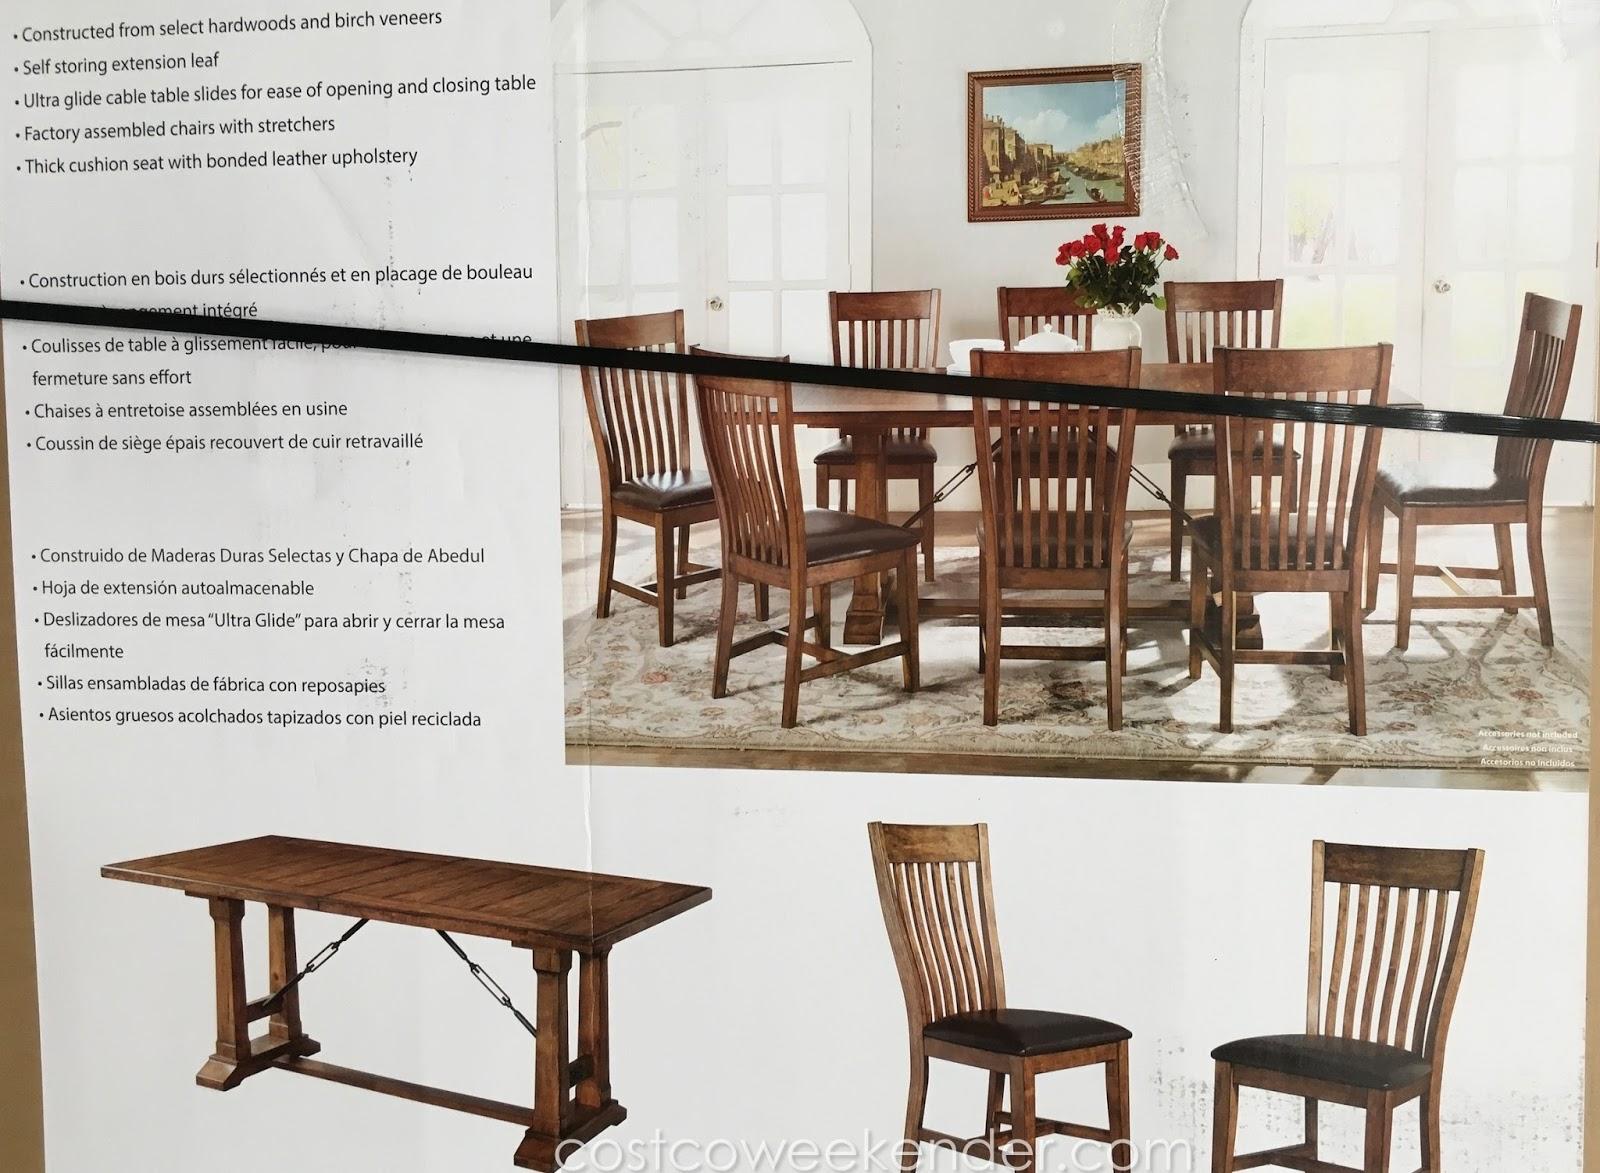 Imagio Home Furniture 9 piece Birch Veneer Dining Set